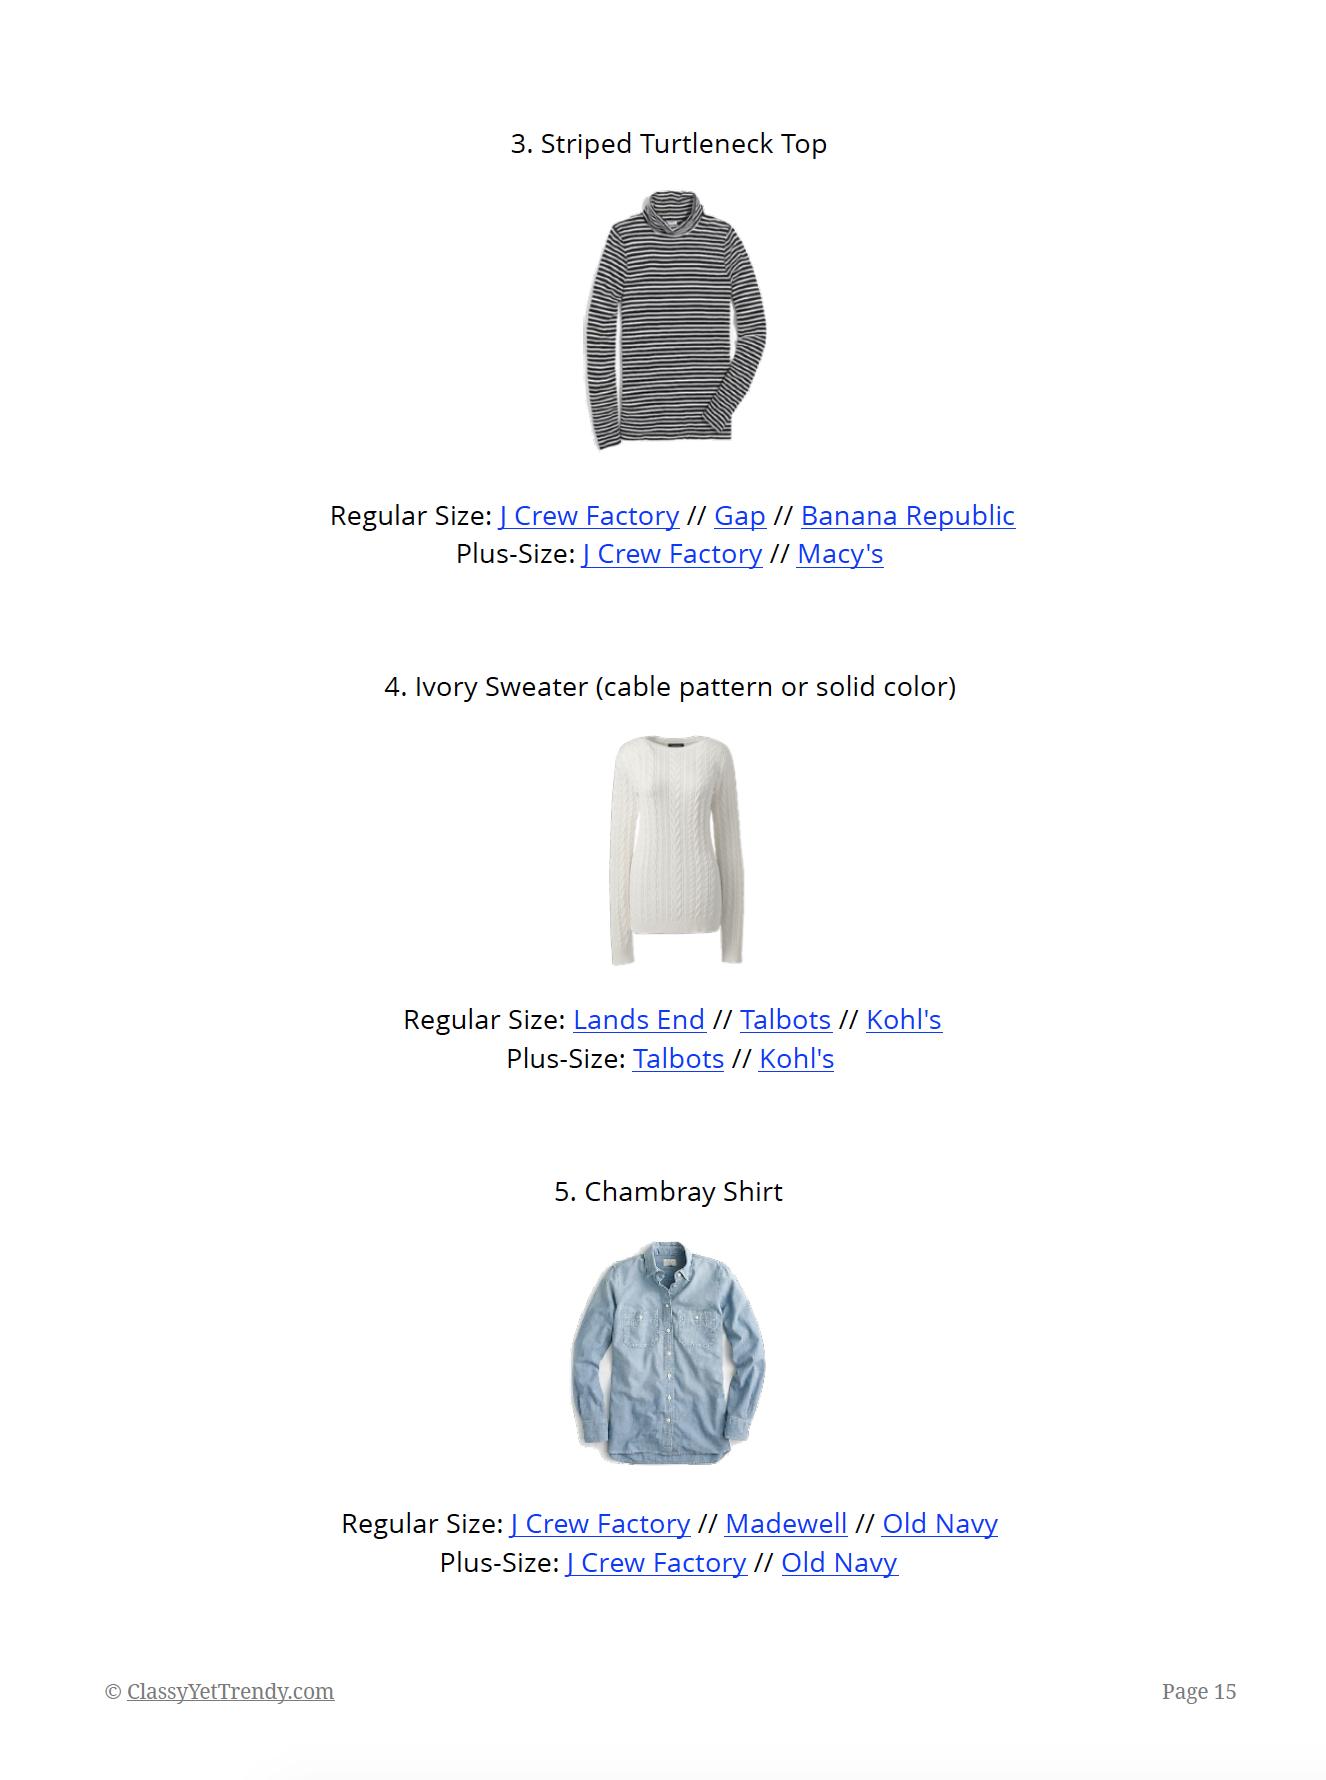 Essential Capsule Wardrobe Winter 2018-2019 - page 15